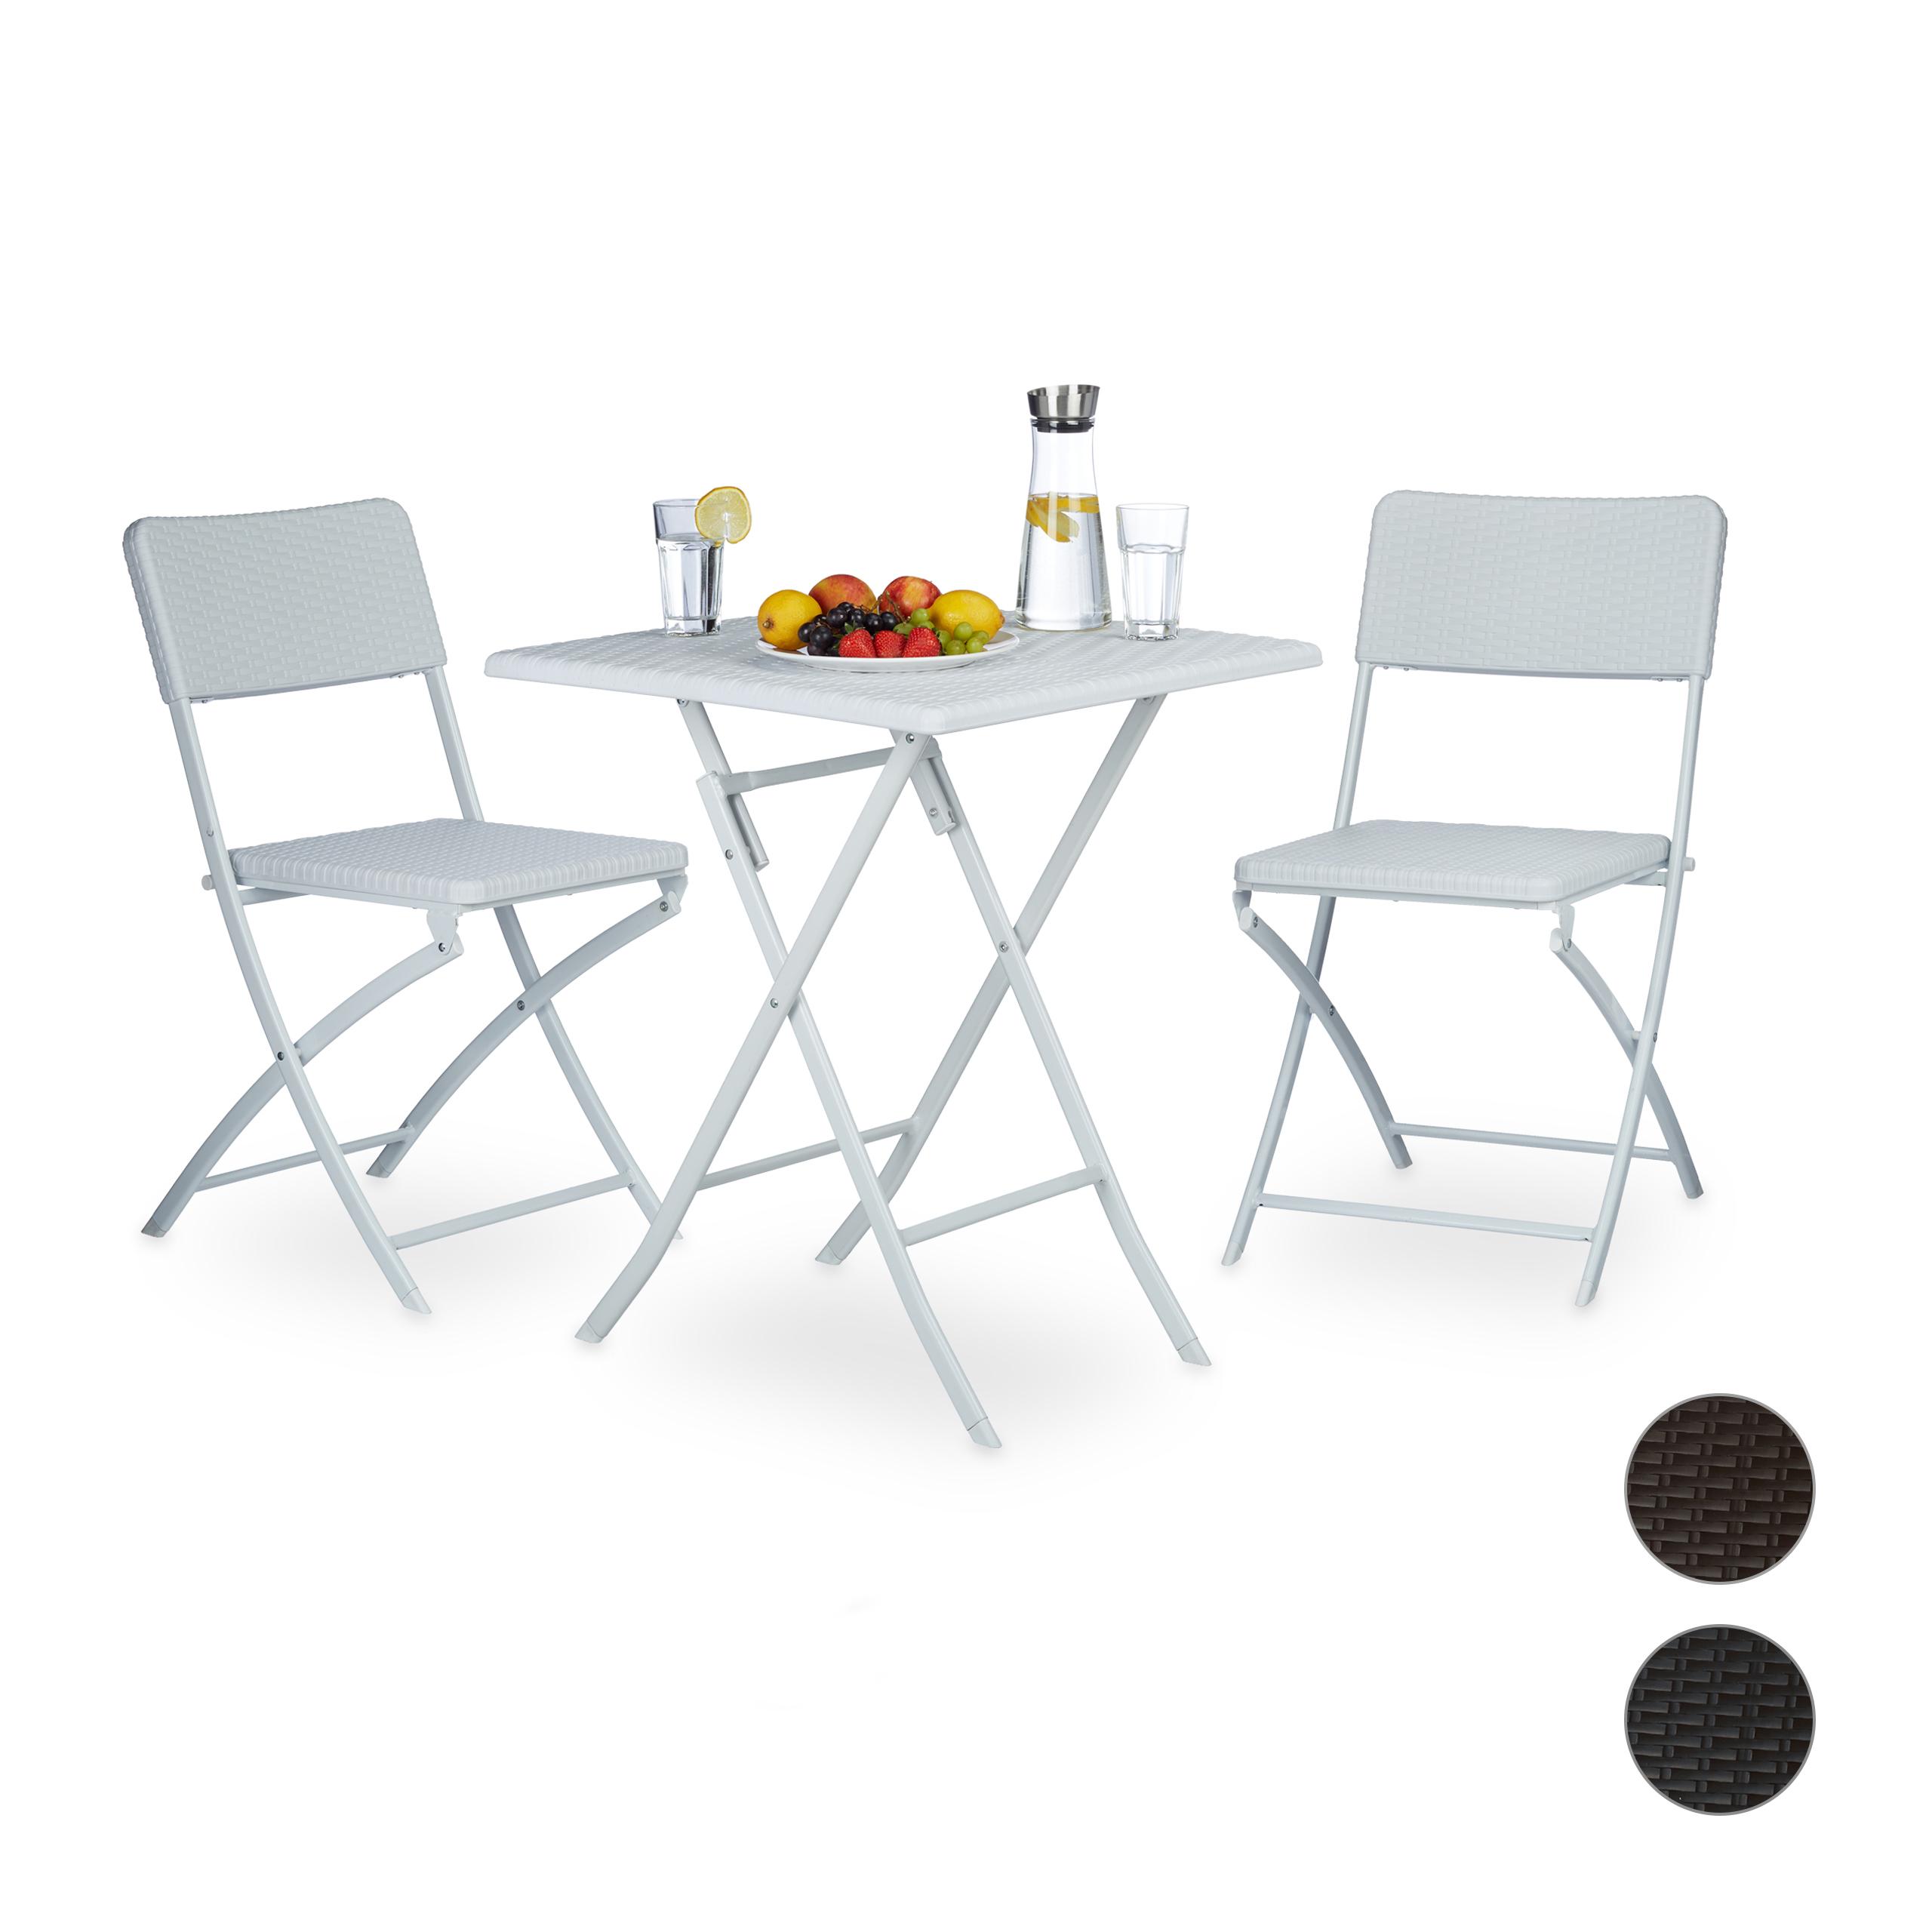 Gartenmobel-klappbar-BASTIAN-3er-Sitzgruppe-Rattan-Balkonmobel-Gartengarnitur